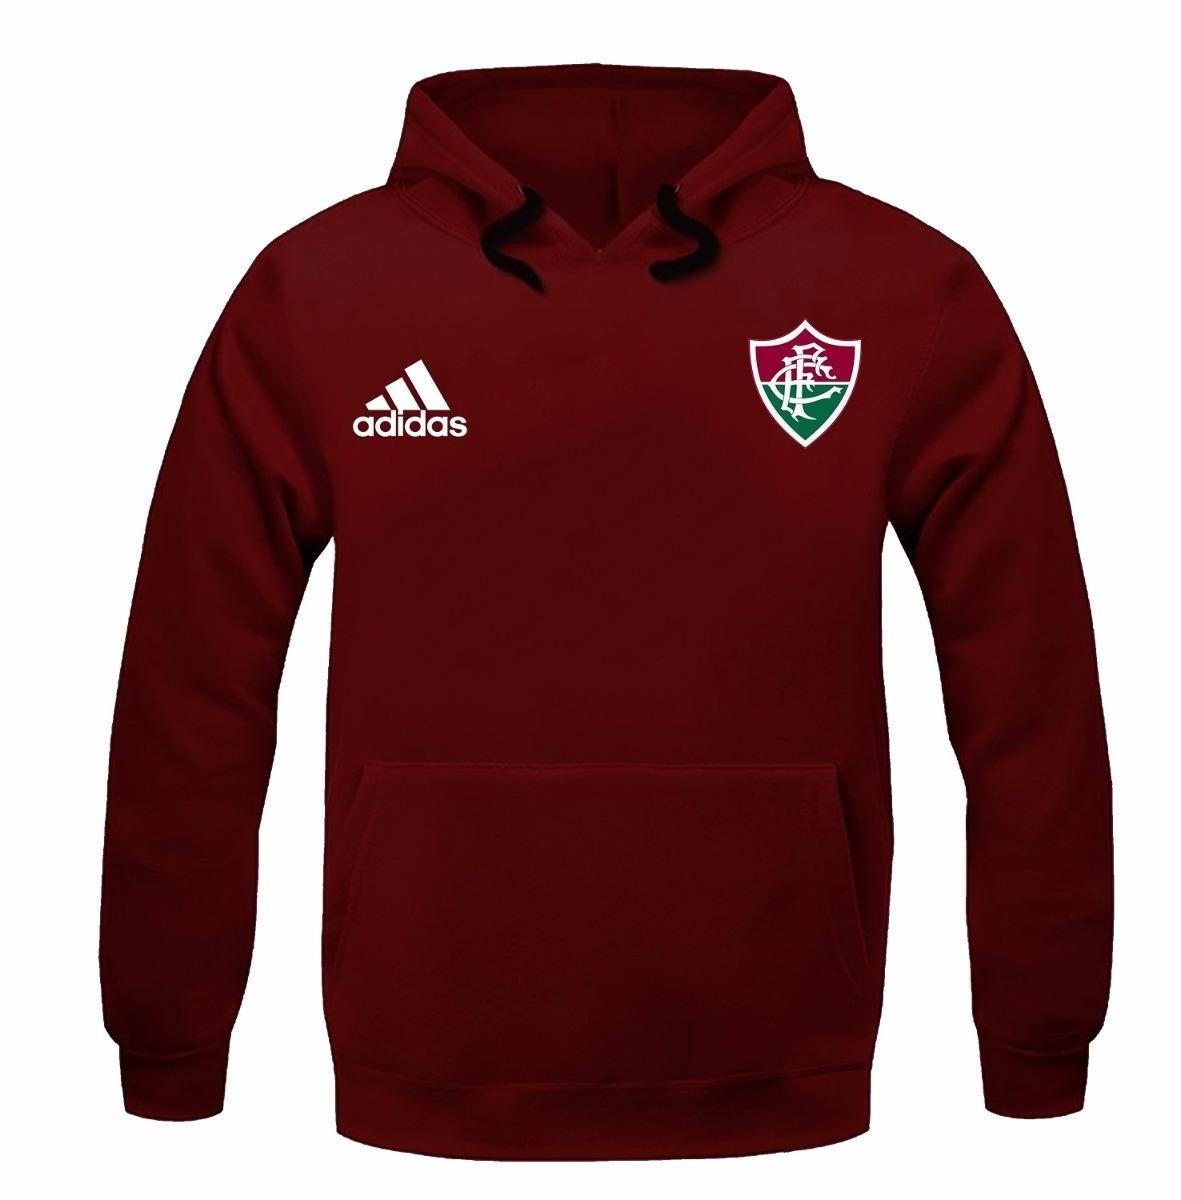 blusa moleton casaco fluminense futebol time tricolor. Carregando zoom. 20aaabd0fc02f